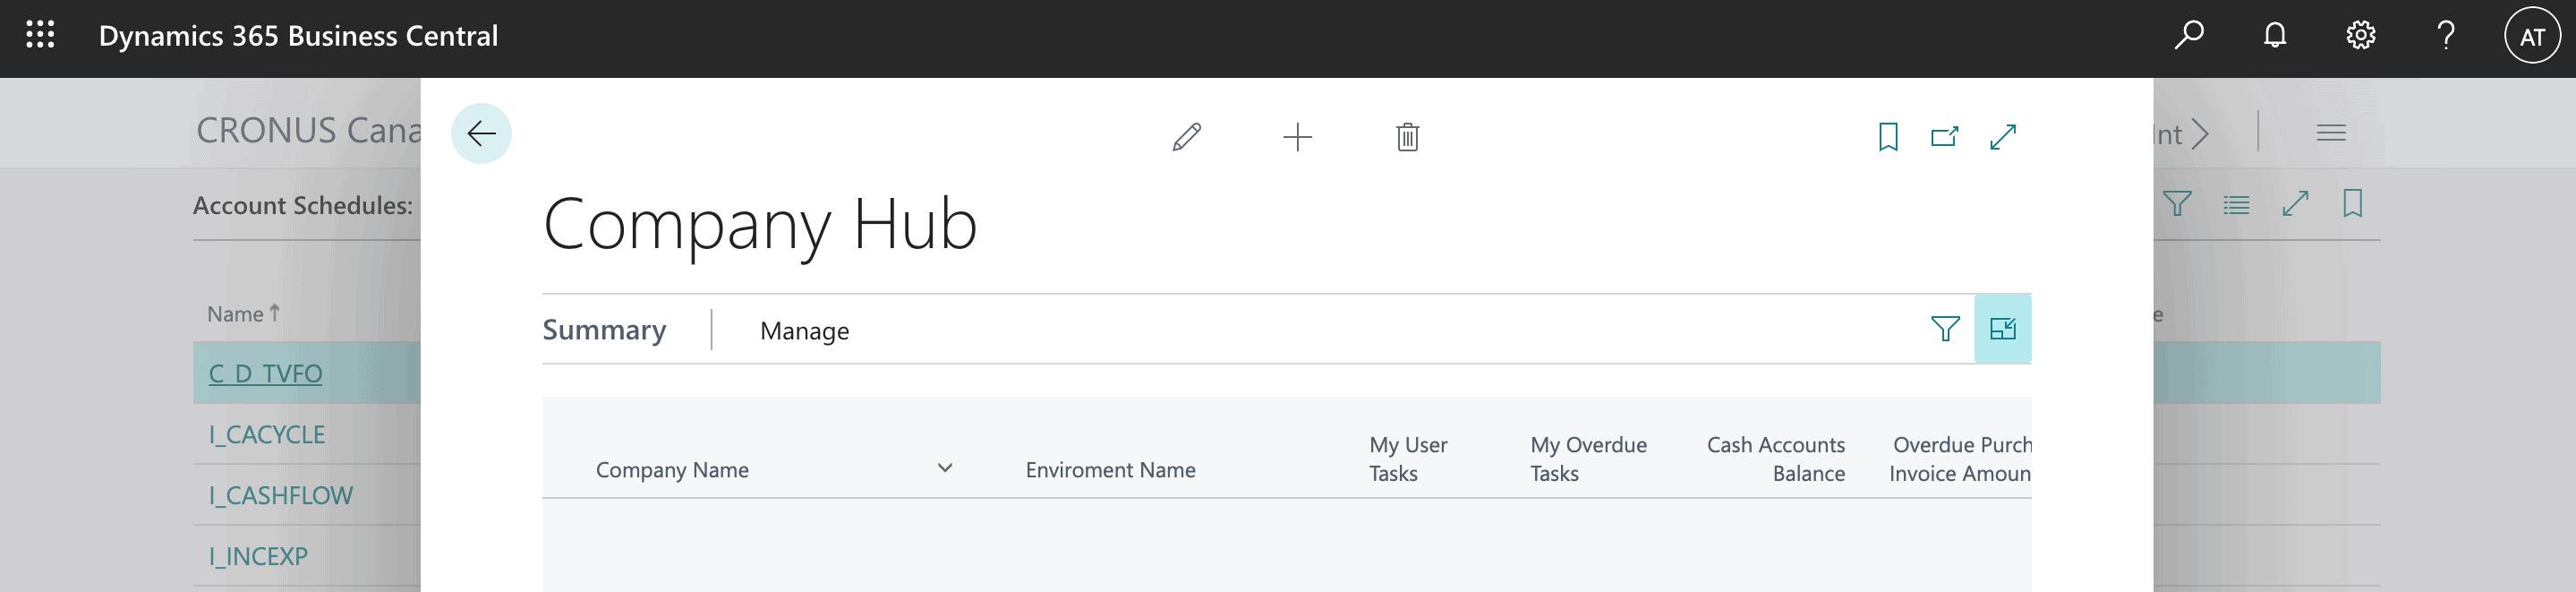 Microsoft Dynamics 365 Business Central Screenshot - Condensed Menu